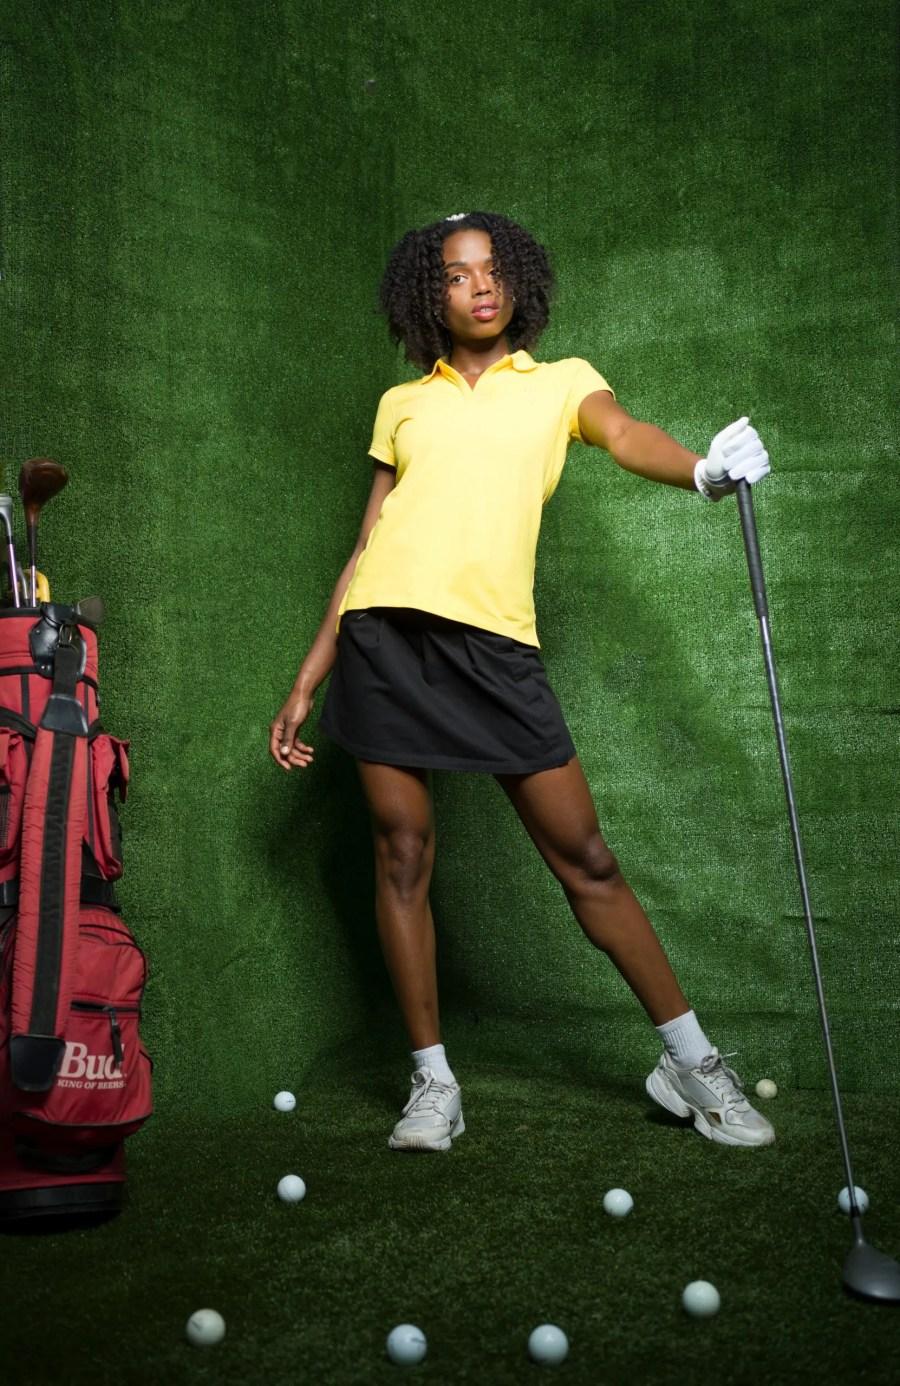 Golf-B0000150